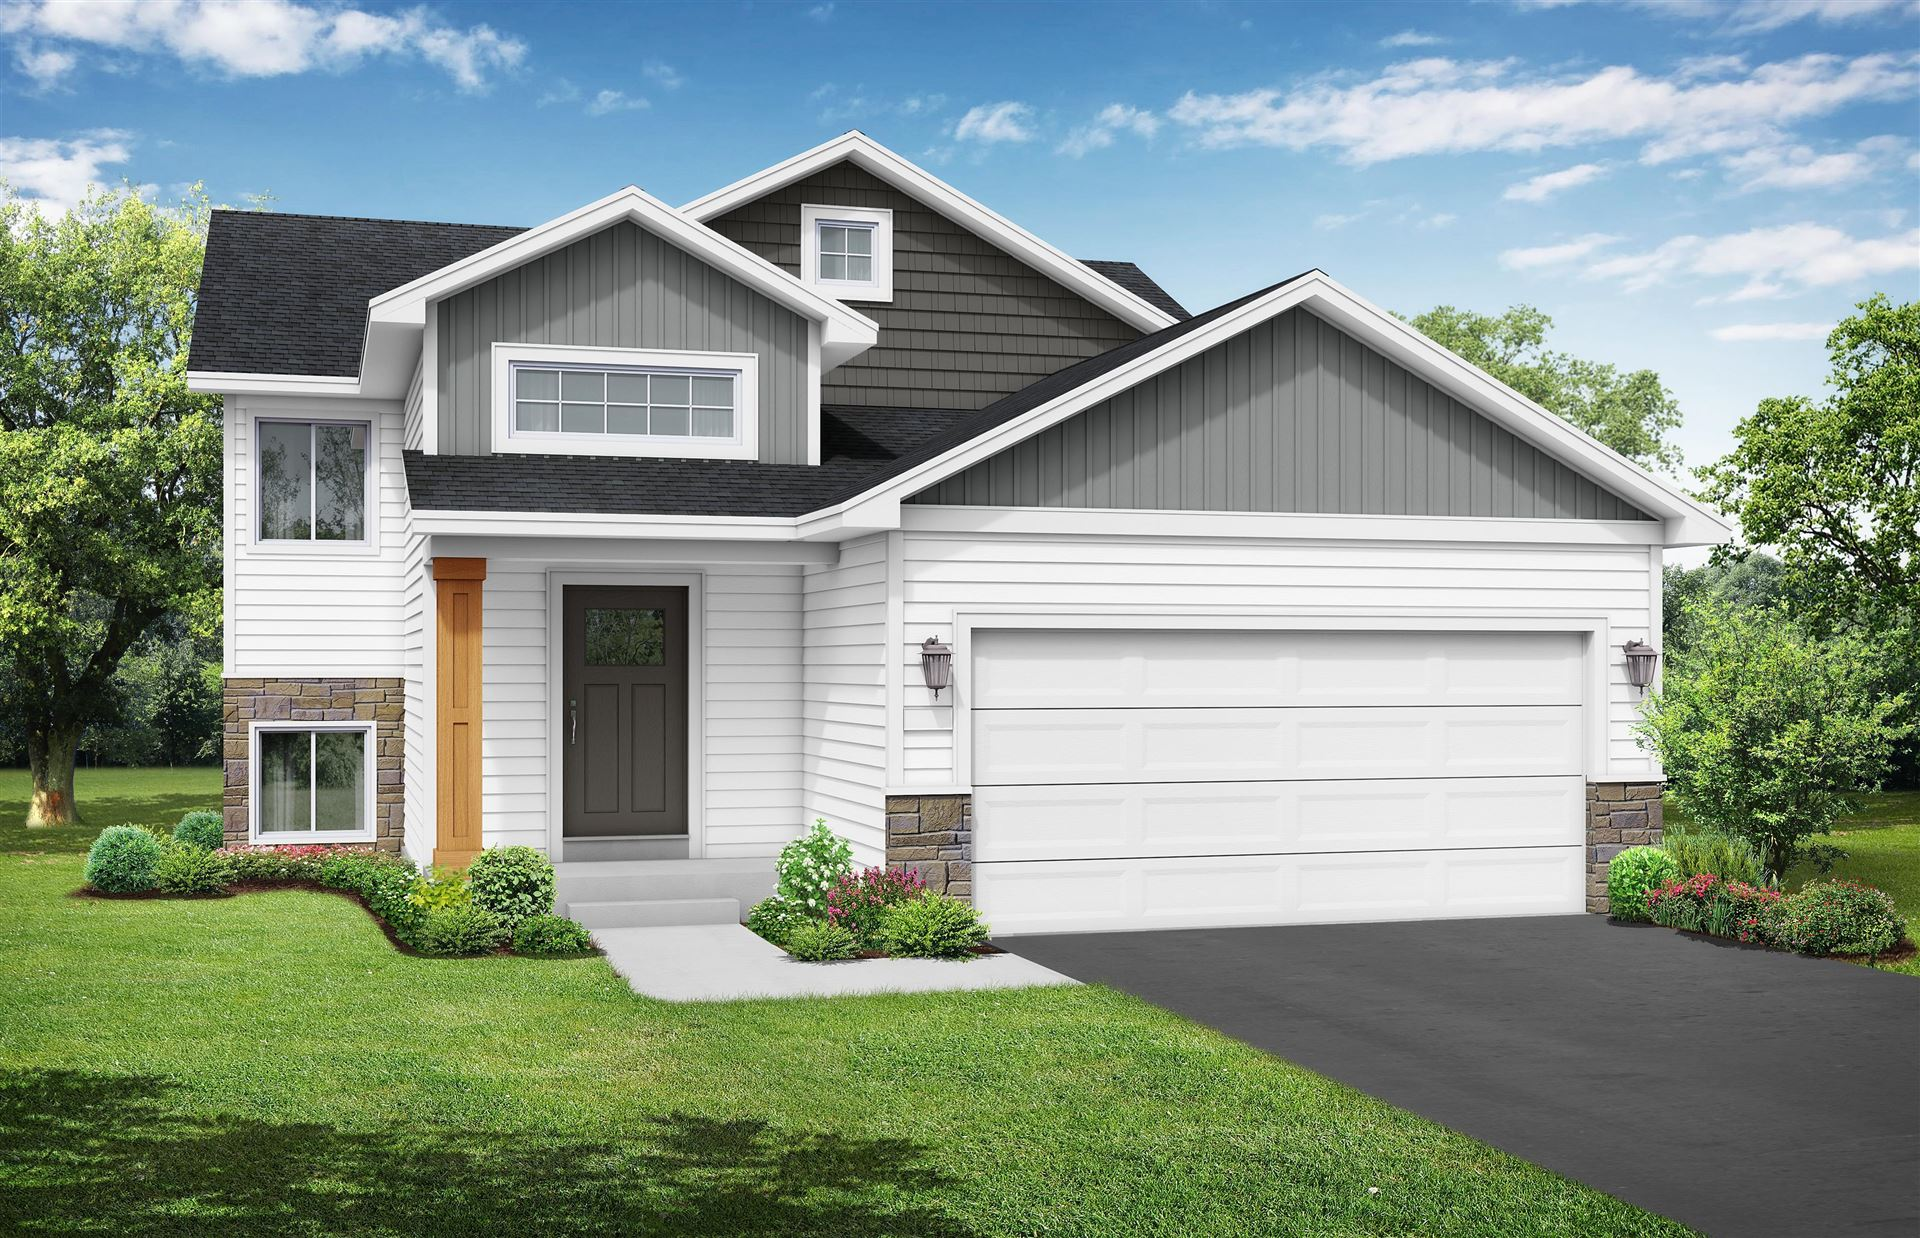 7800 Monroe Street NE, Spring Lake Park, MN 55432 - MLS#: 5659824